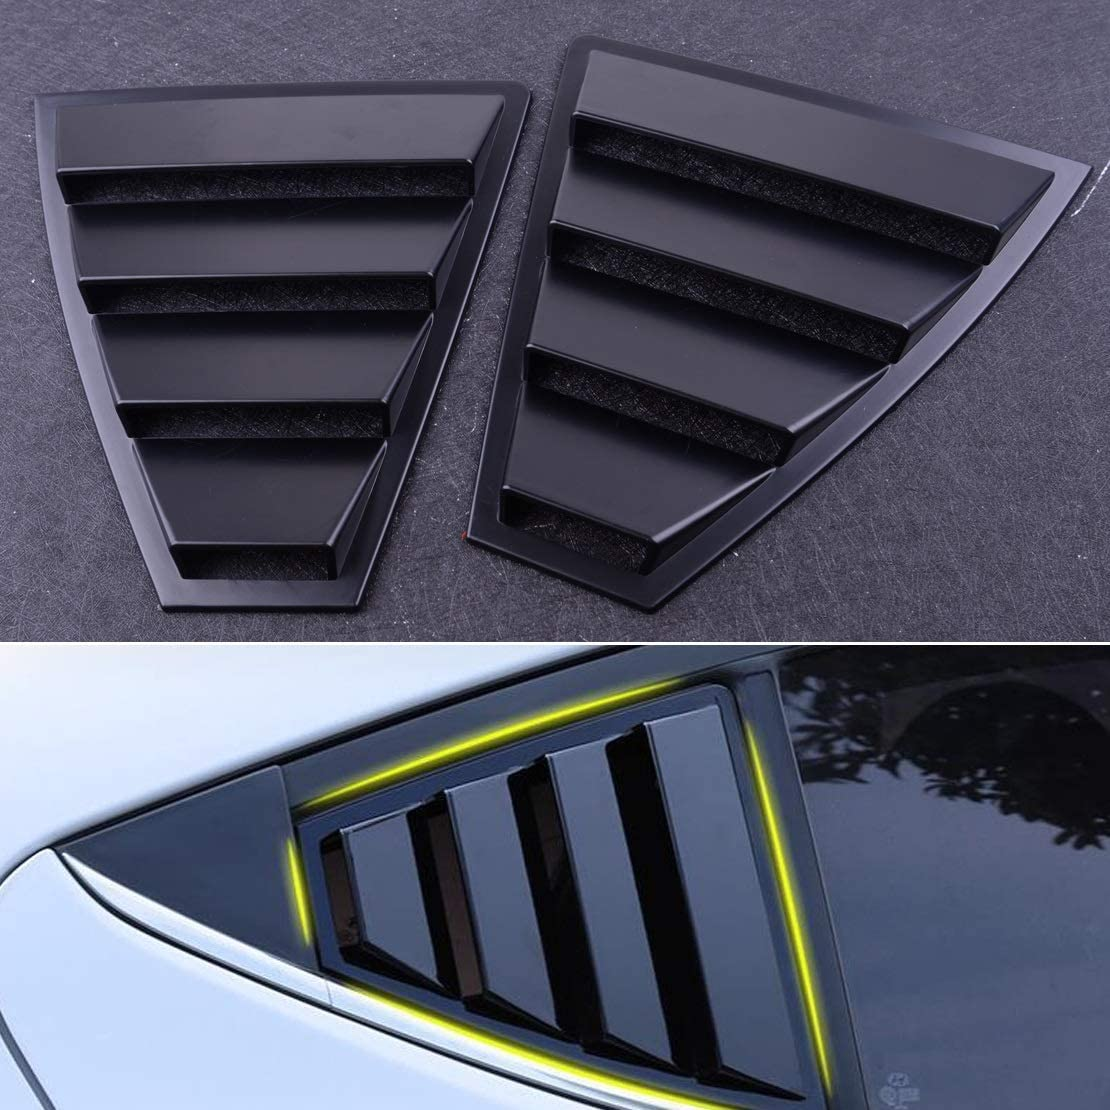 YANGLIYU Car Accessories 2 PCS Plastic Side Black Rear Quality inspection W 5 popular Quarter